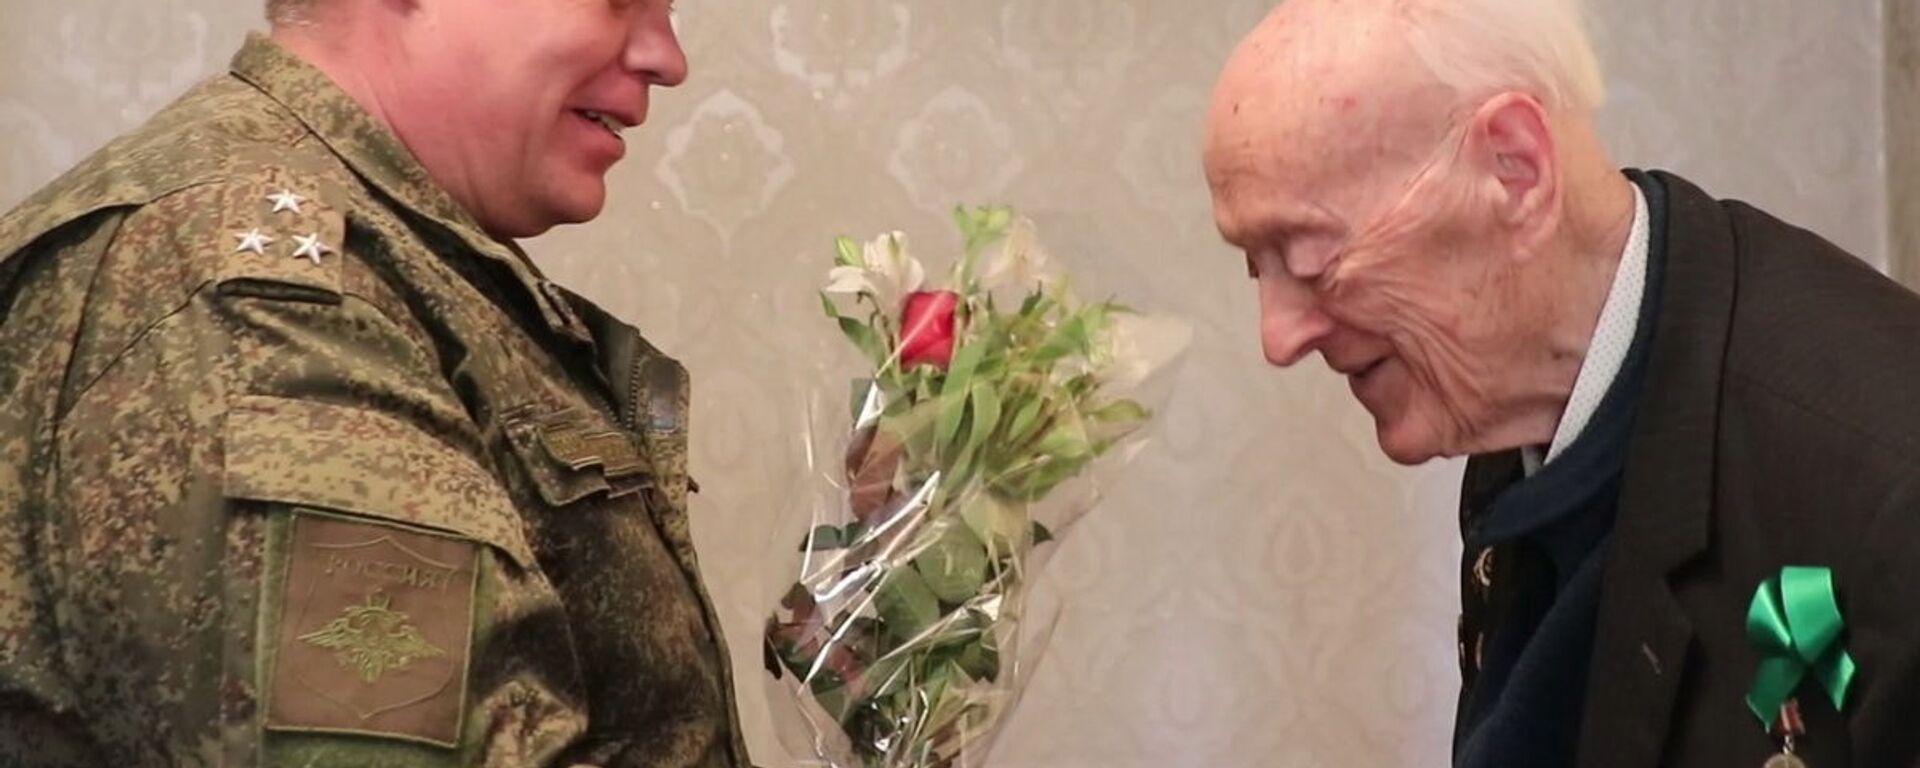 Командир РВБ  Серей Горячев в Таджикистане поздравил ветерана ВОВ Олега Соболева - Sputnik Таджикистан, 1920, 06.04.2021